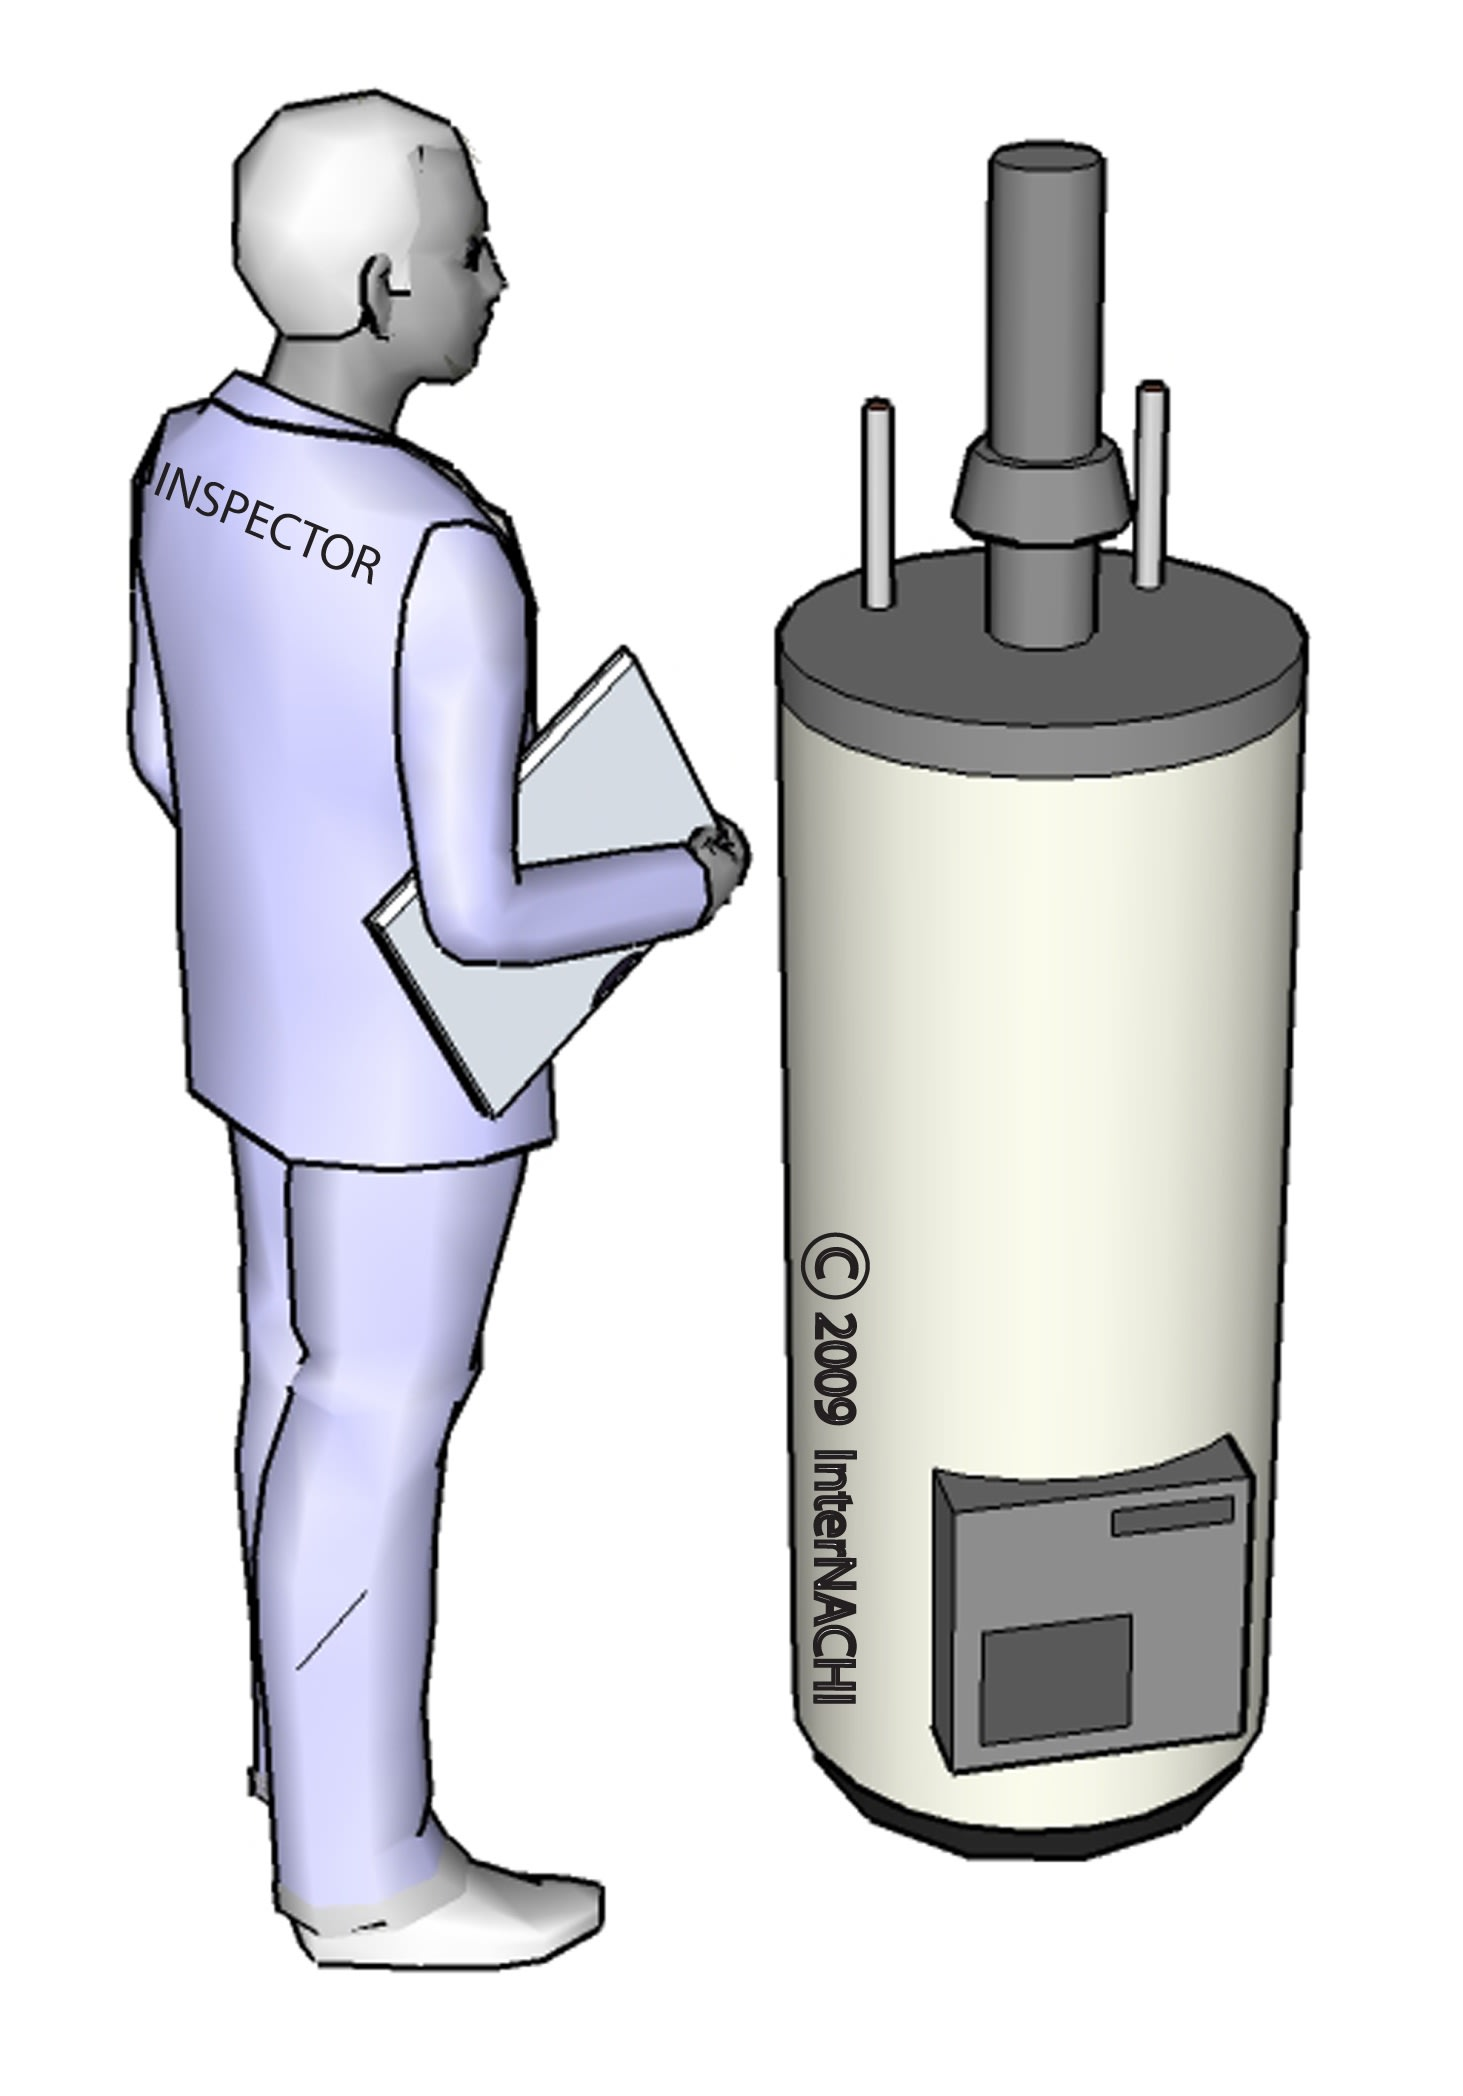 Waterheater inspection.